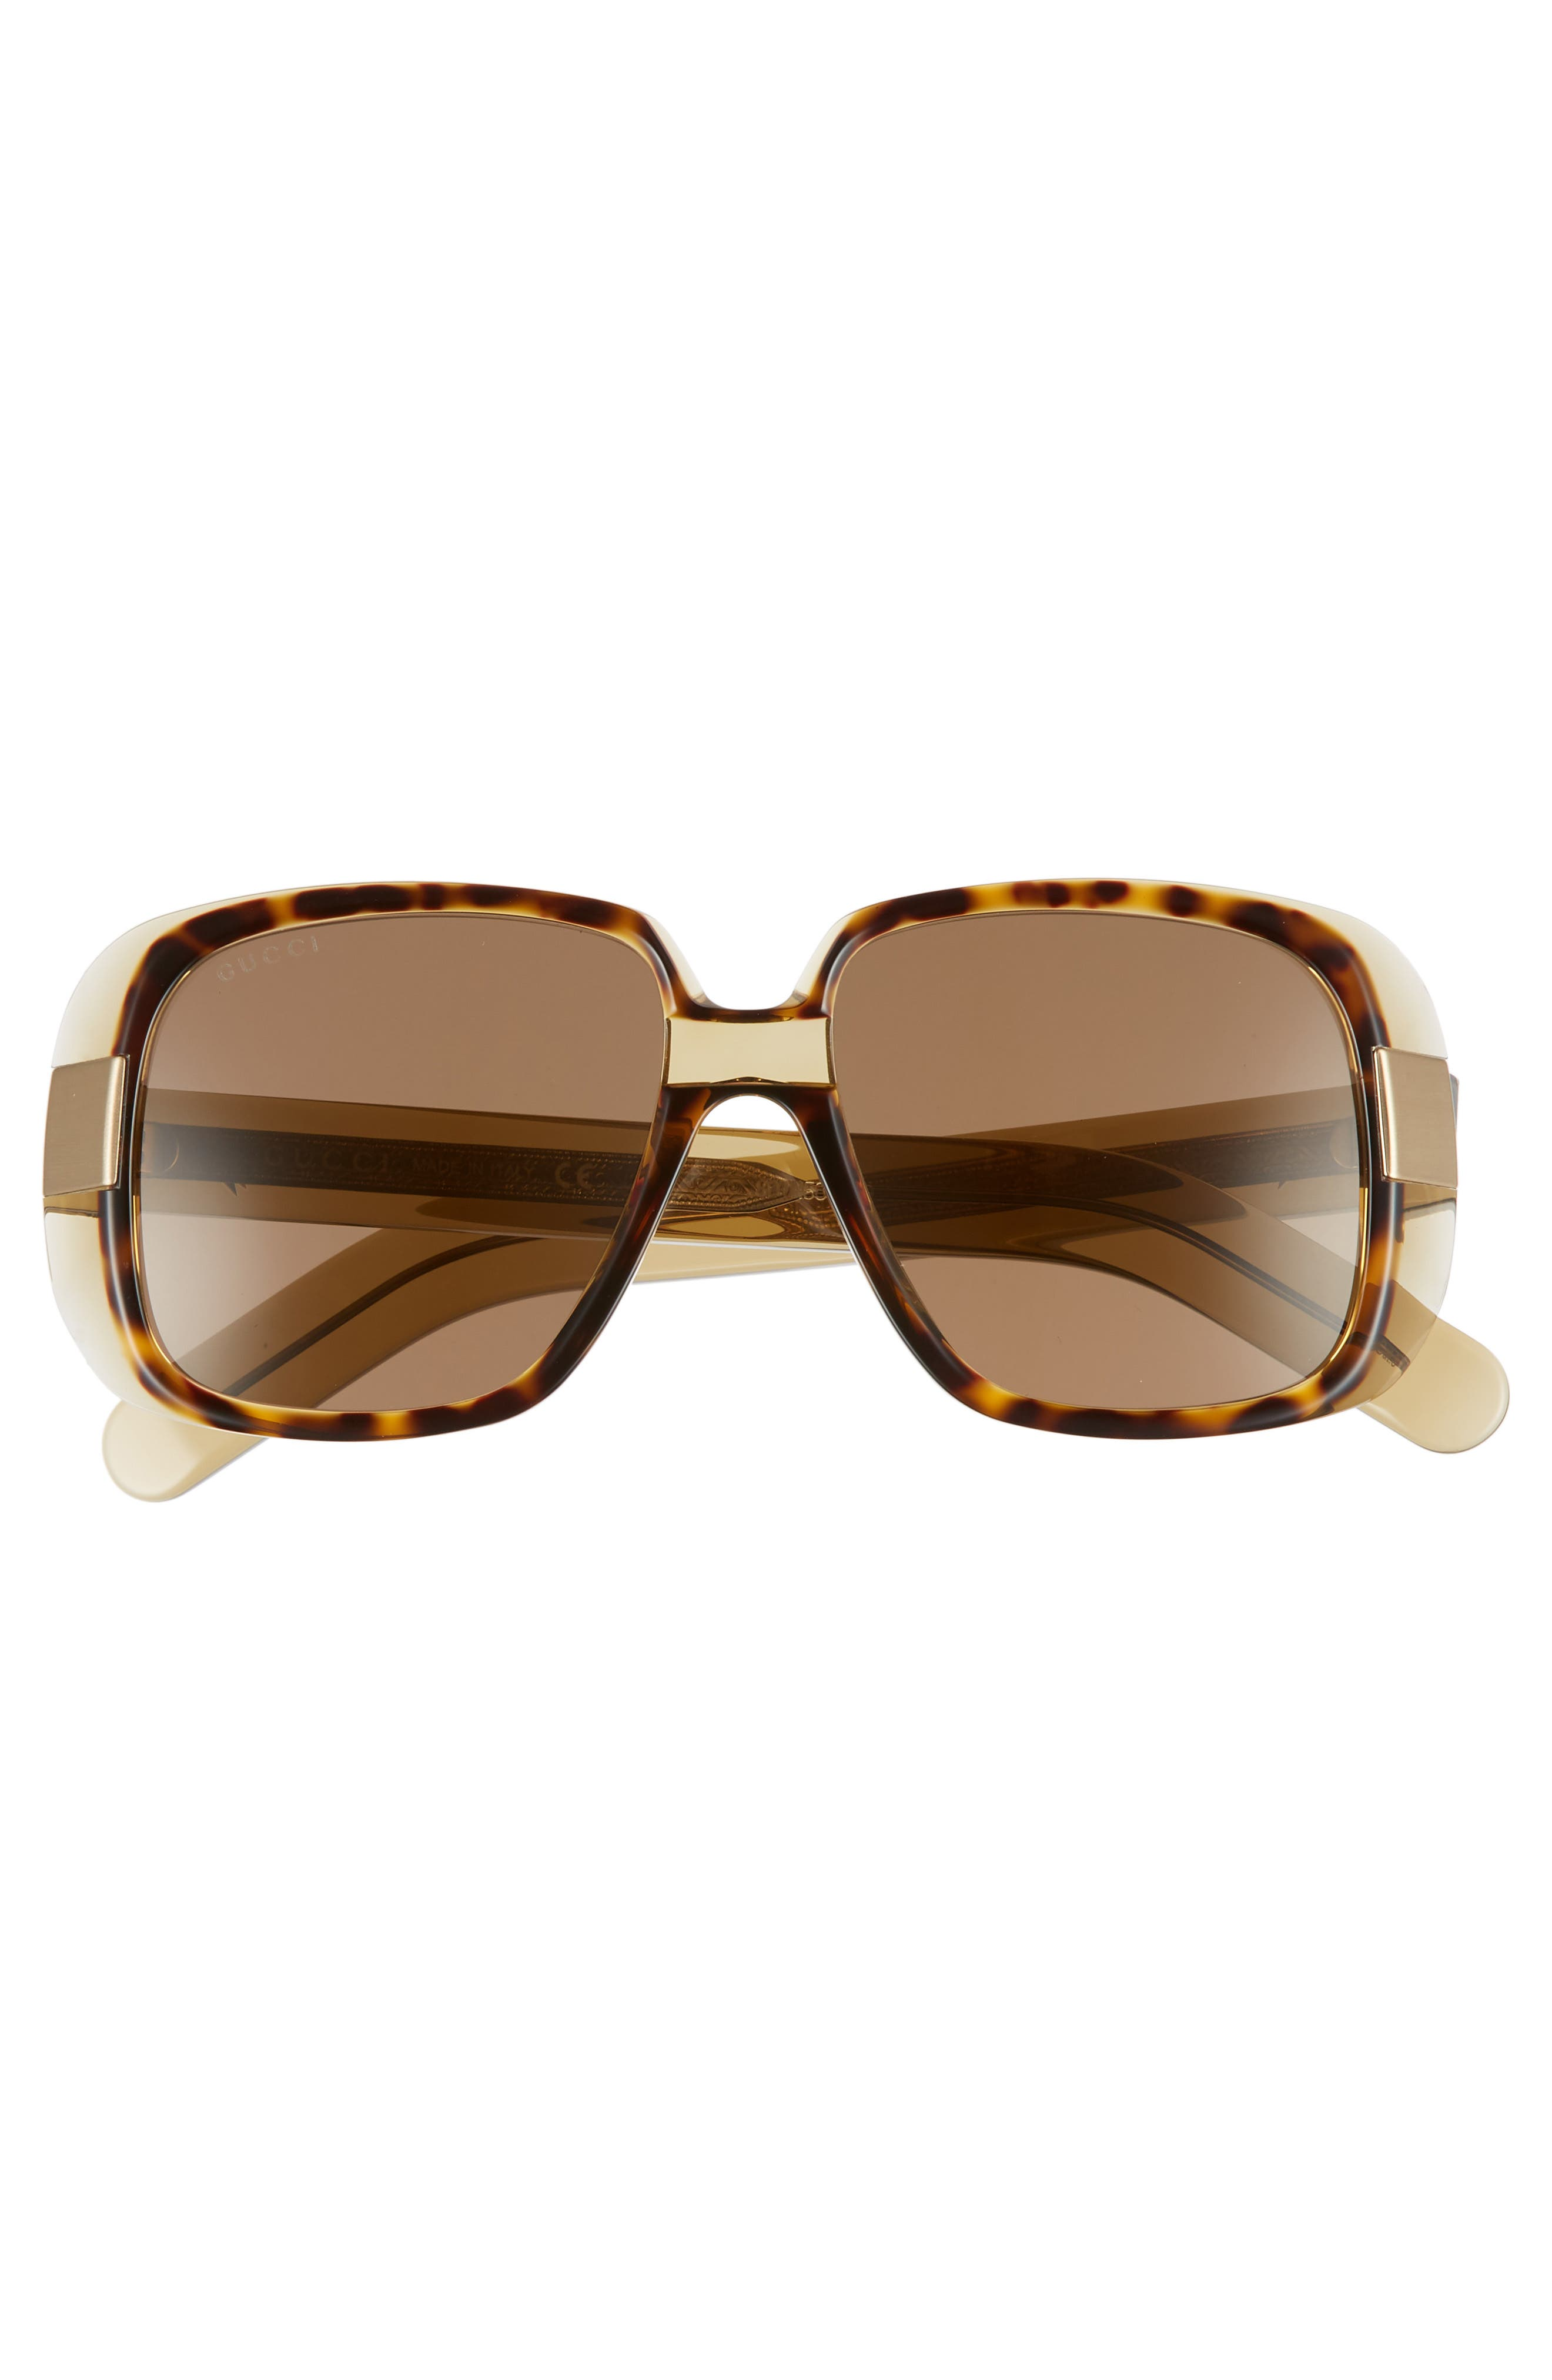 Cruise 51mm Square Sunglasses,                             Alternate thumbnail 2, color,                             Olive